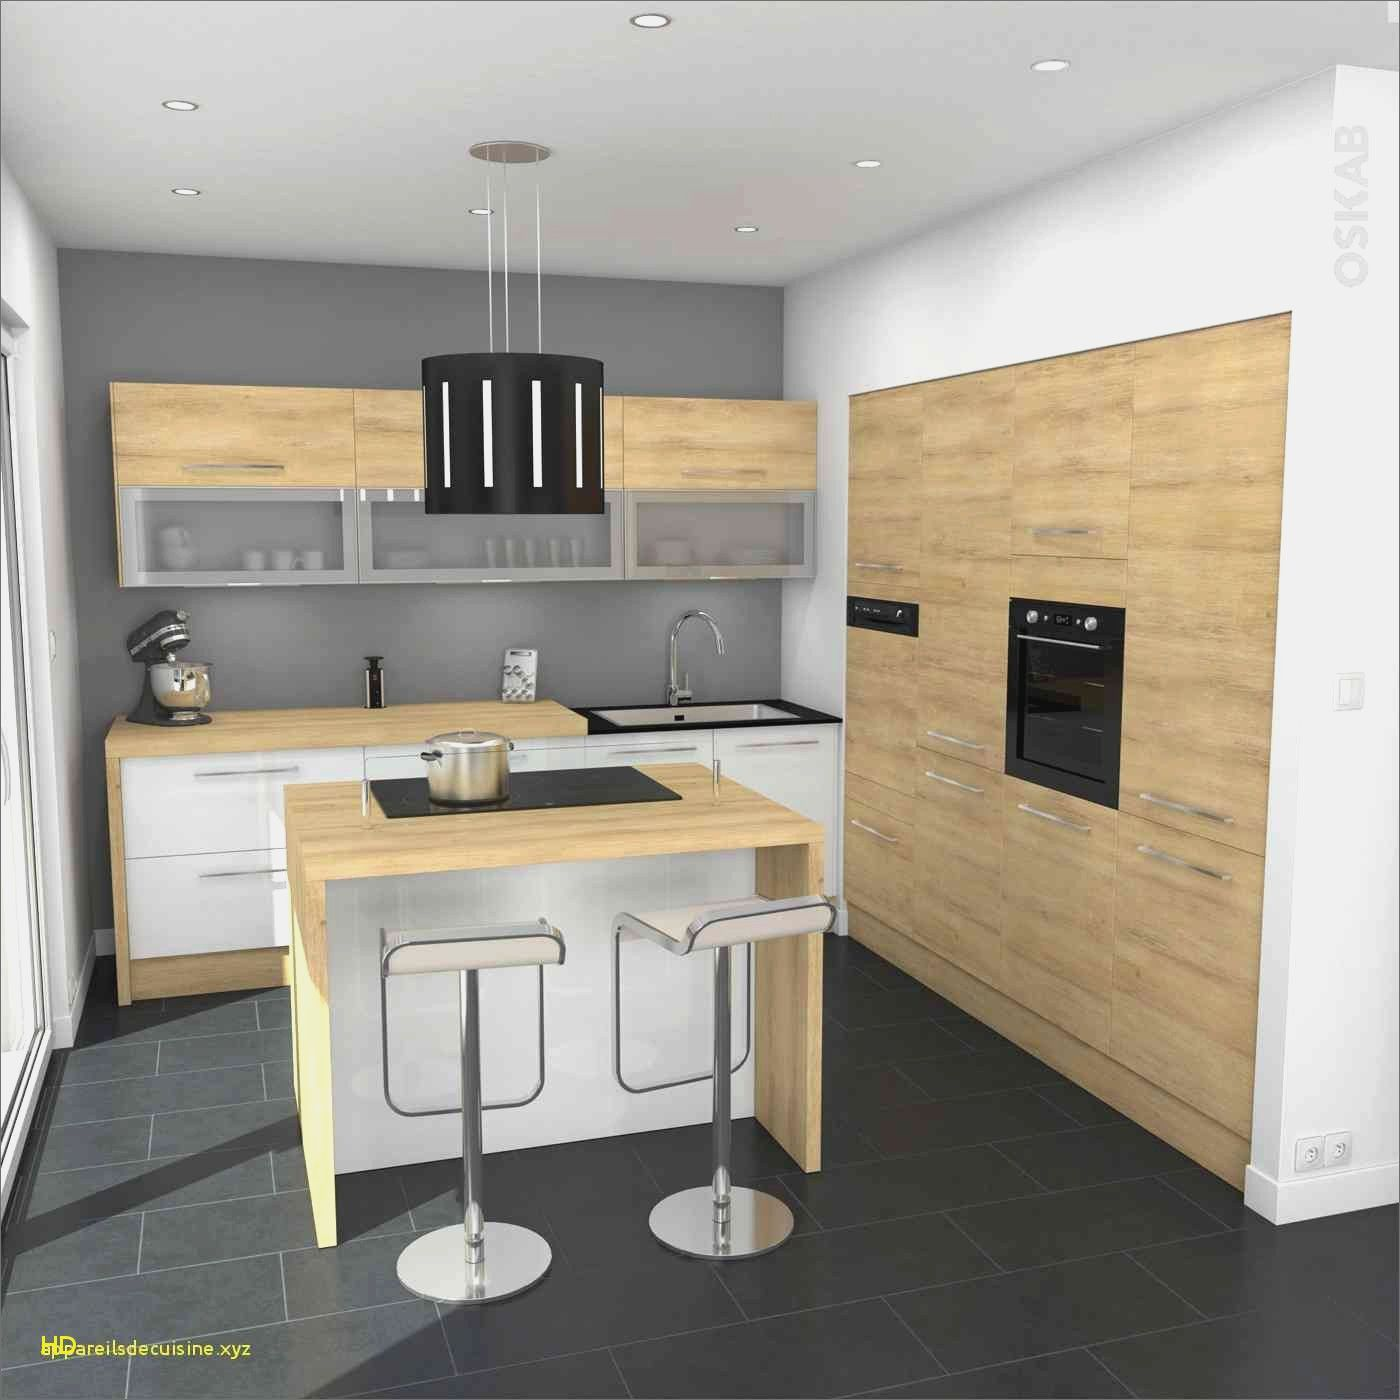 Luxury Meuble Cuisine Bois Brut Kitchen Without Handles Wooden